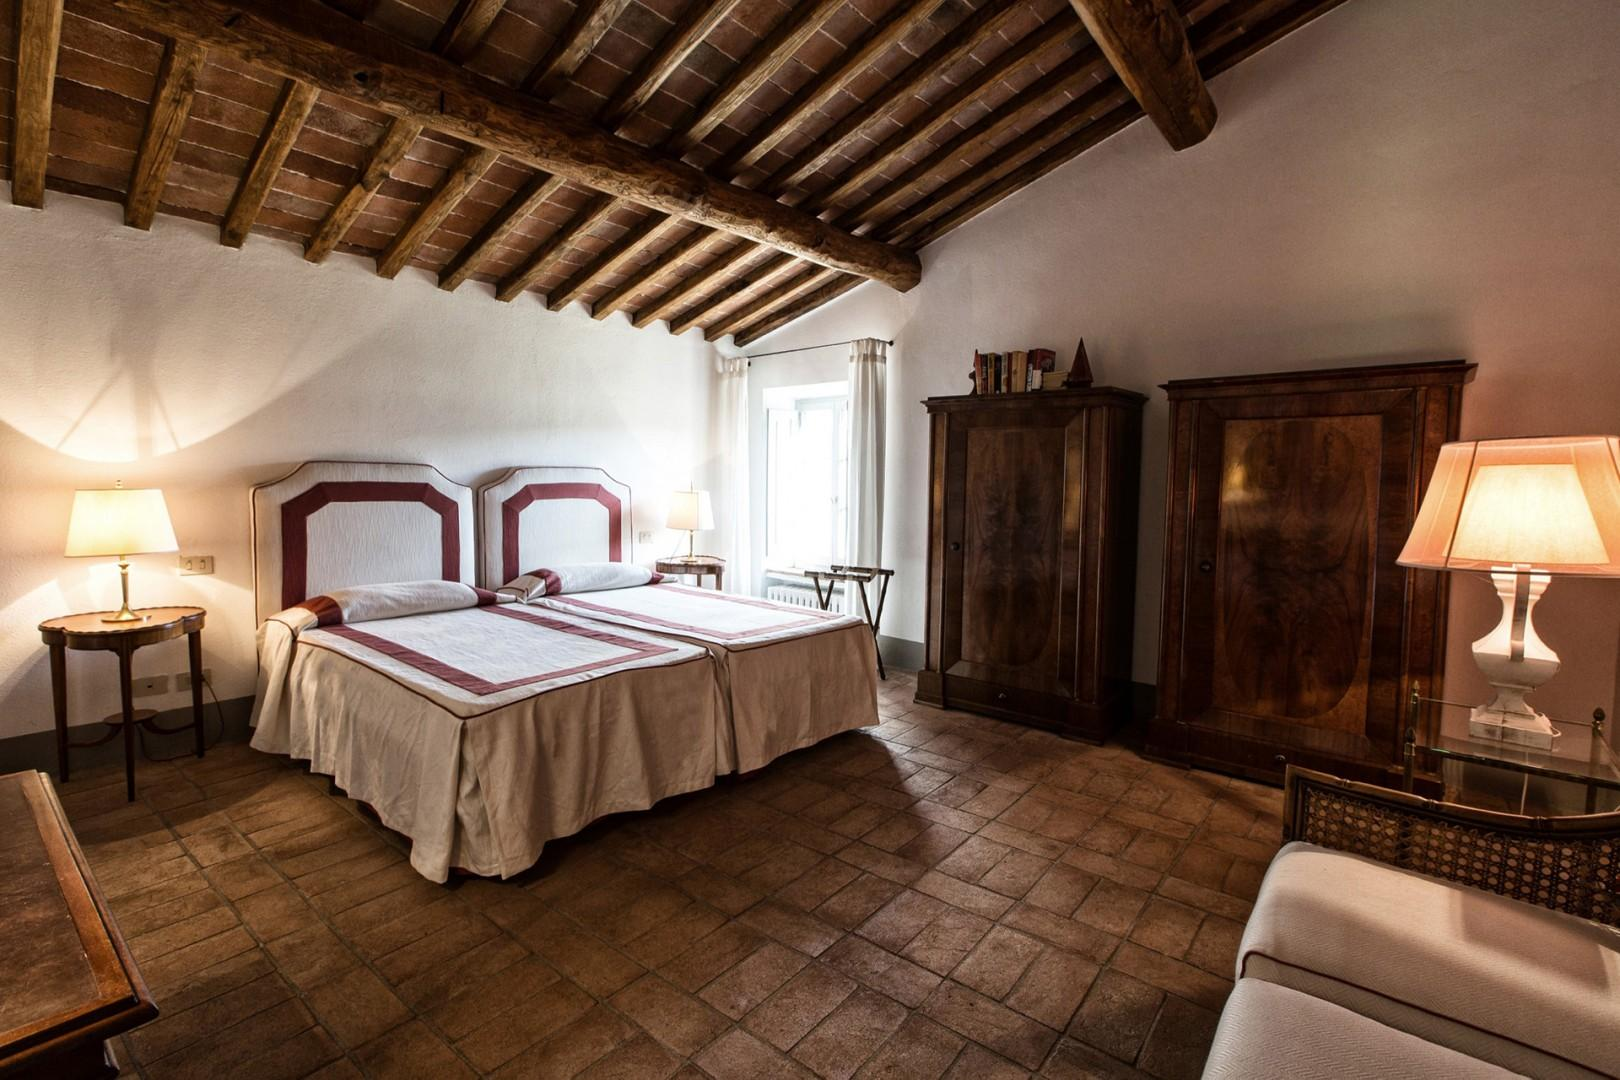 2nd Floor bedroom 6 with combinable beds.